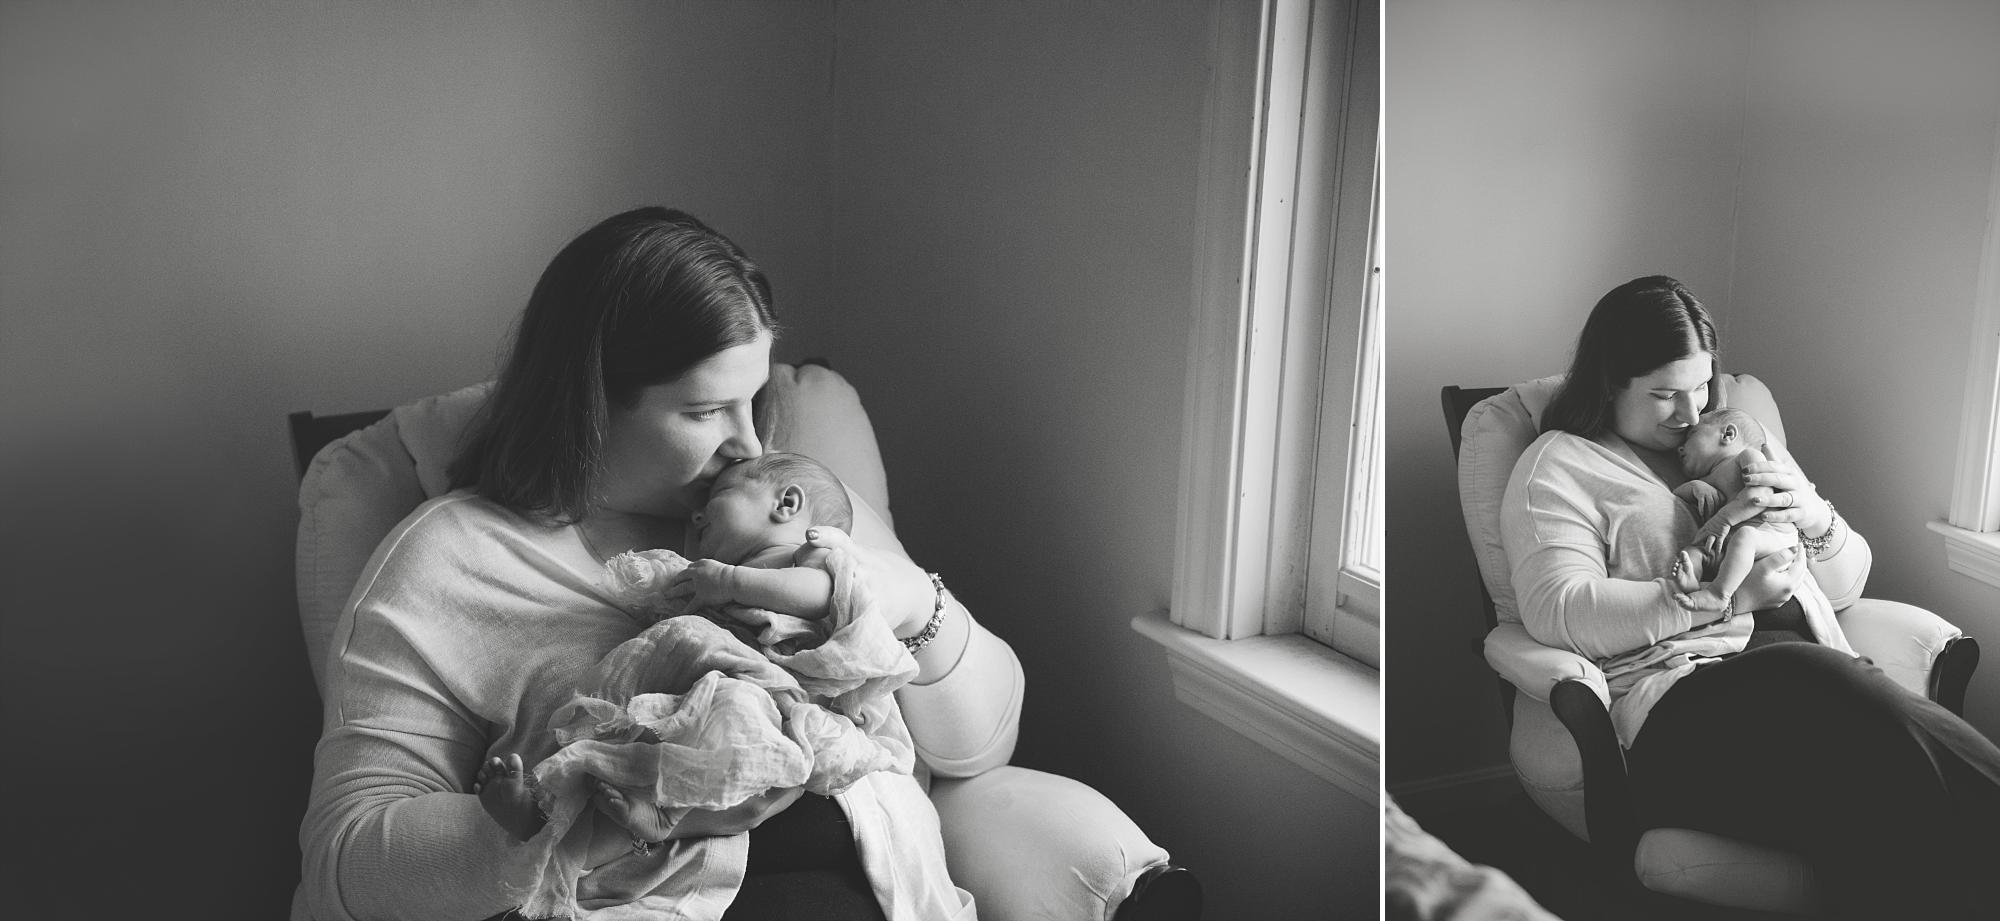 mom-holding-newborn-glider-window-lifestyle